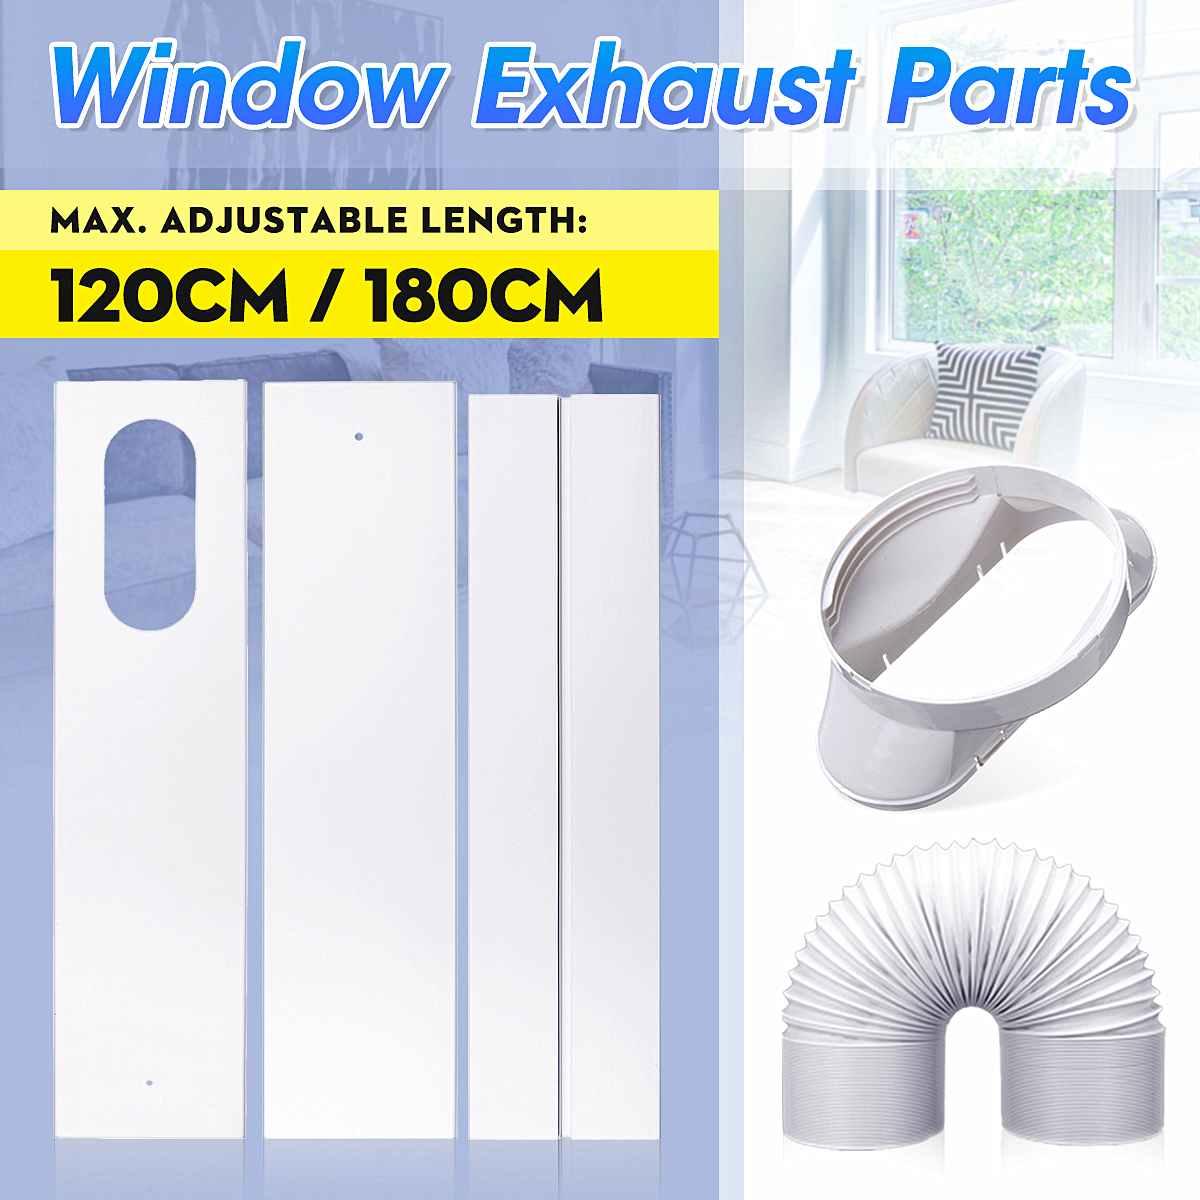 Tubo de escape para ventana, placa deslizante, sello de bloqueo de ventana ajustable para aire acondicionado móvil, accesorios de aire acondicionado DIY para hogar